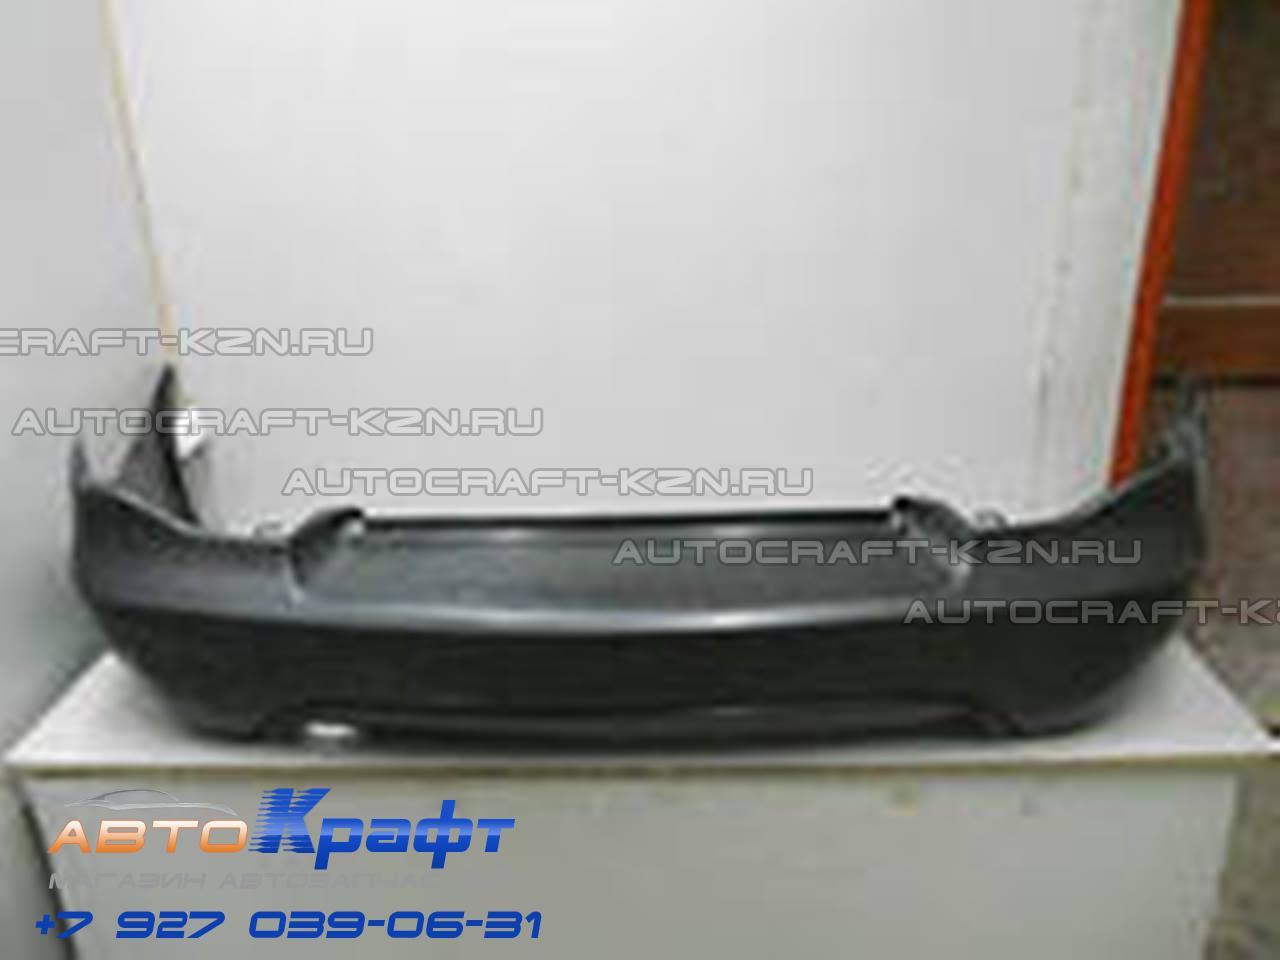 Бампер задний Daewoo Nexia 2008- S3041101| Автозапчасти «AвтоKрафт»